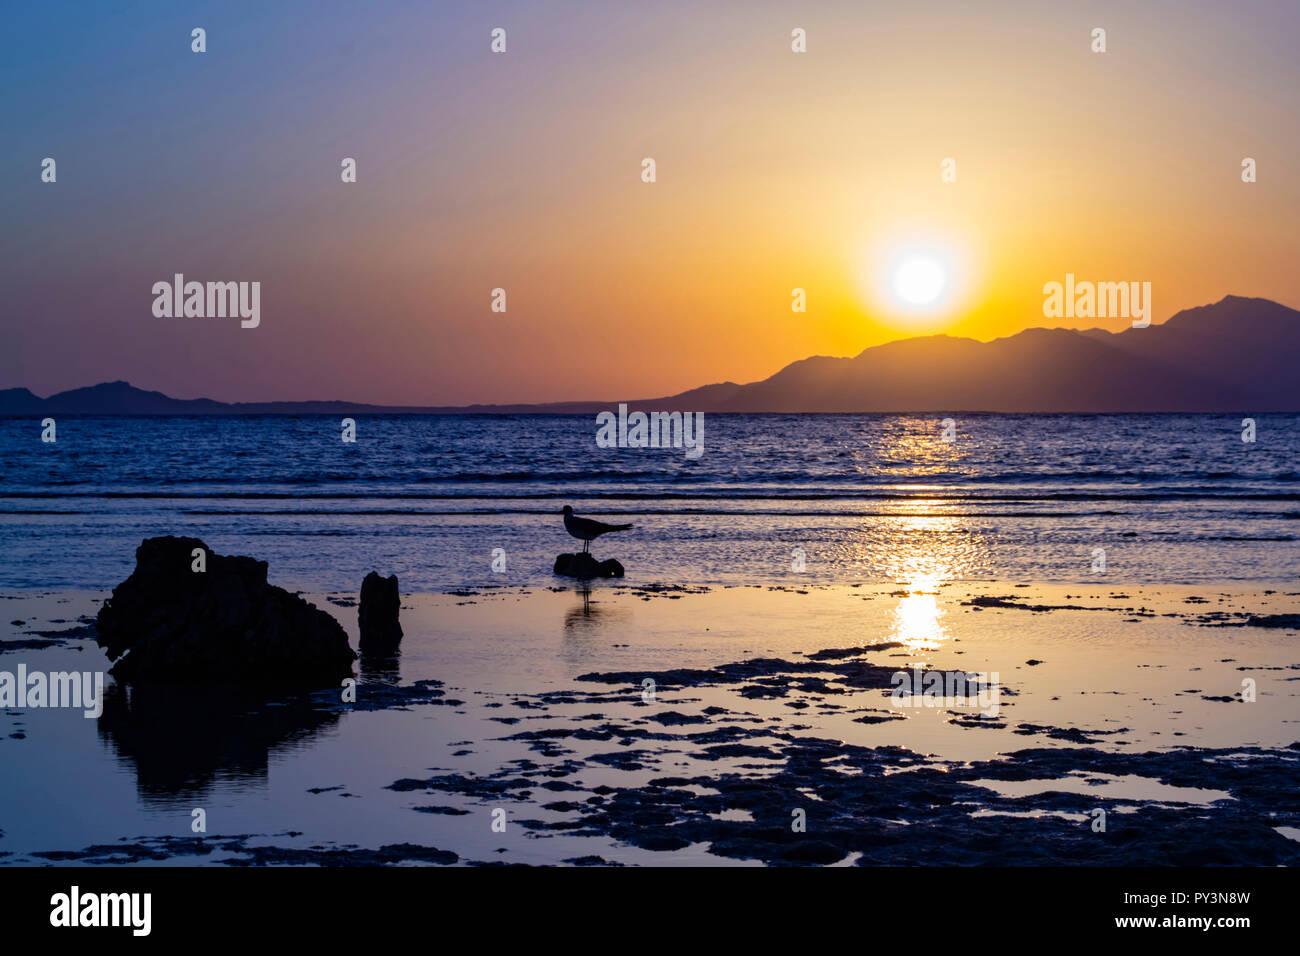 Sunrise auf die Insel Tiran, Saudi-Arabien Stockbild